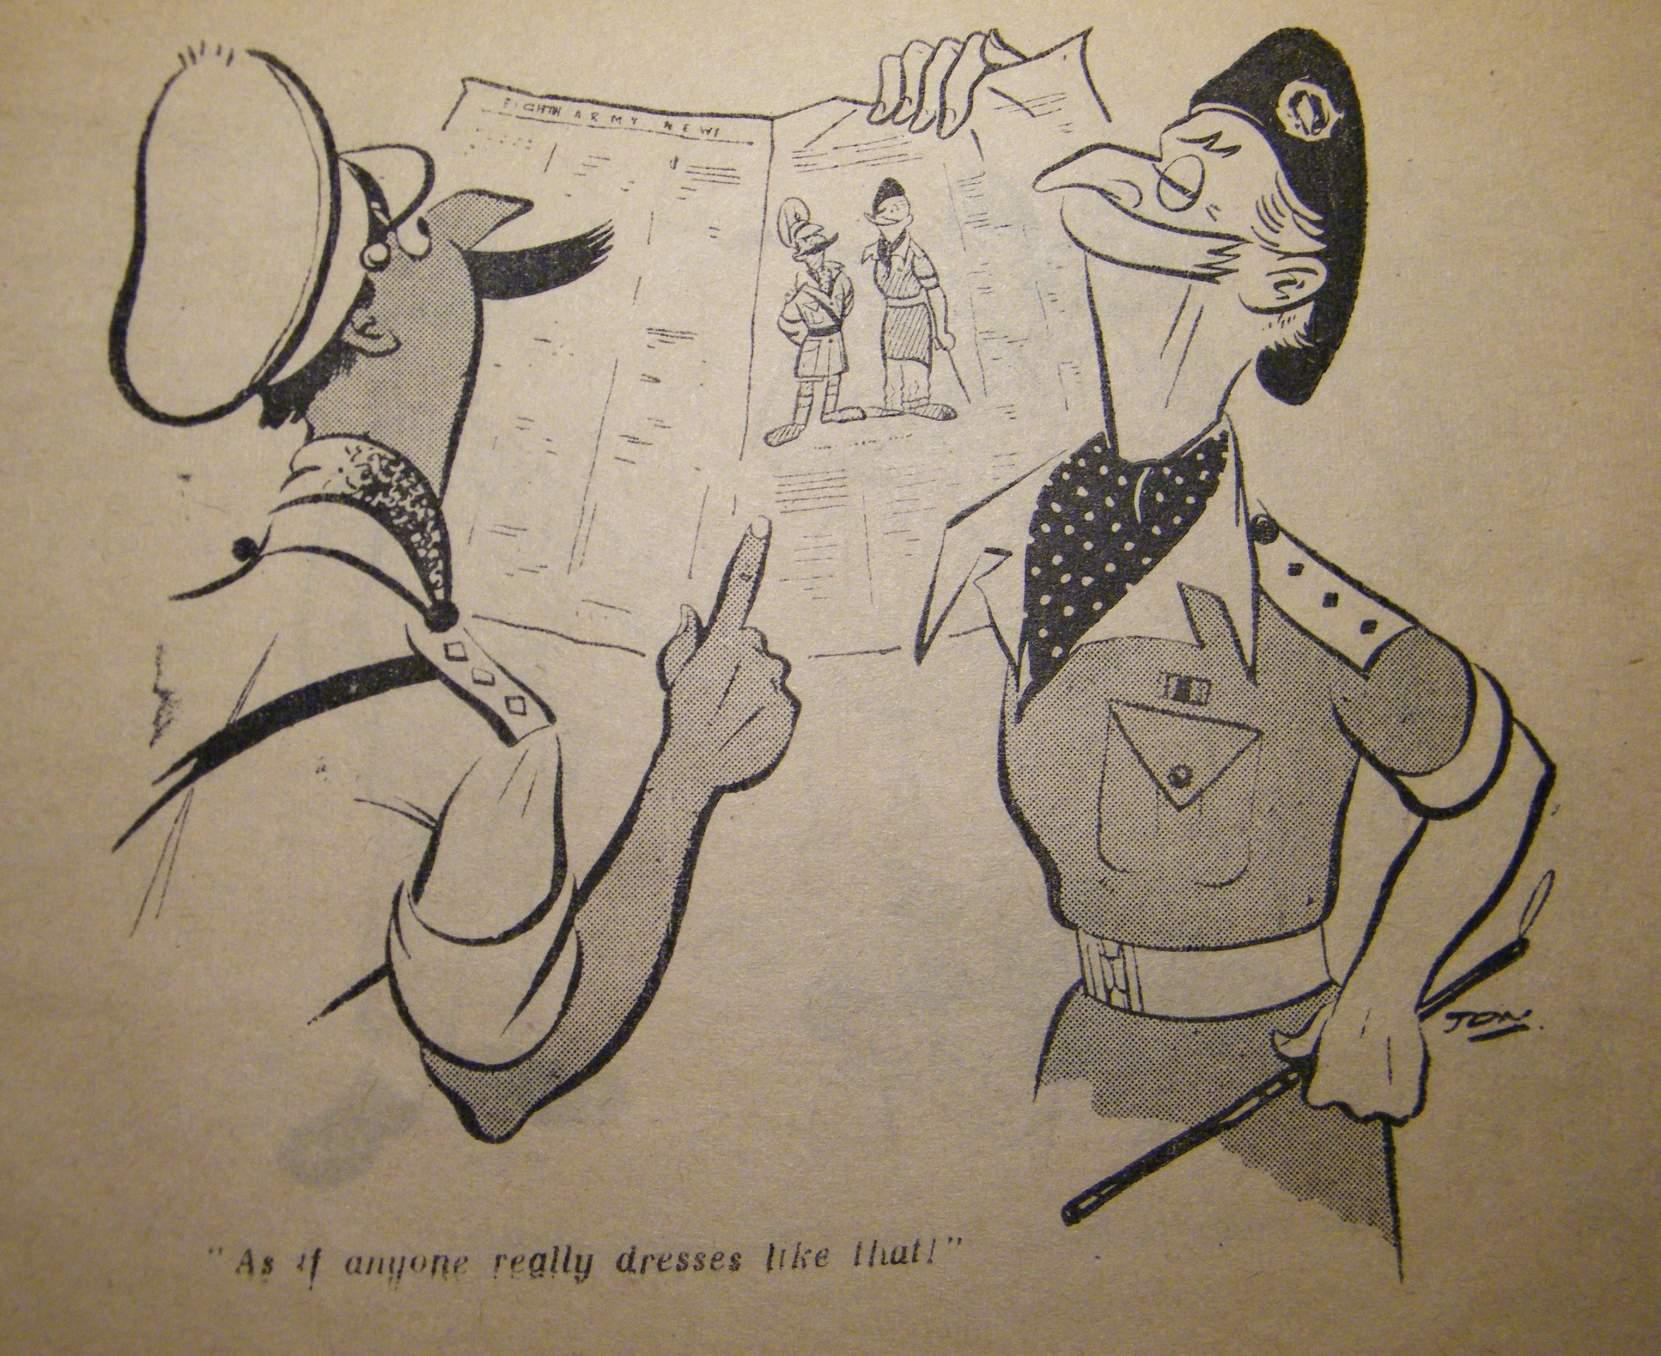 297623d1327530532-two-types-jon-8th-army-cartoon-humour-dscf1527.jpg